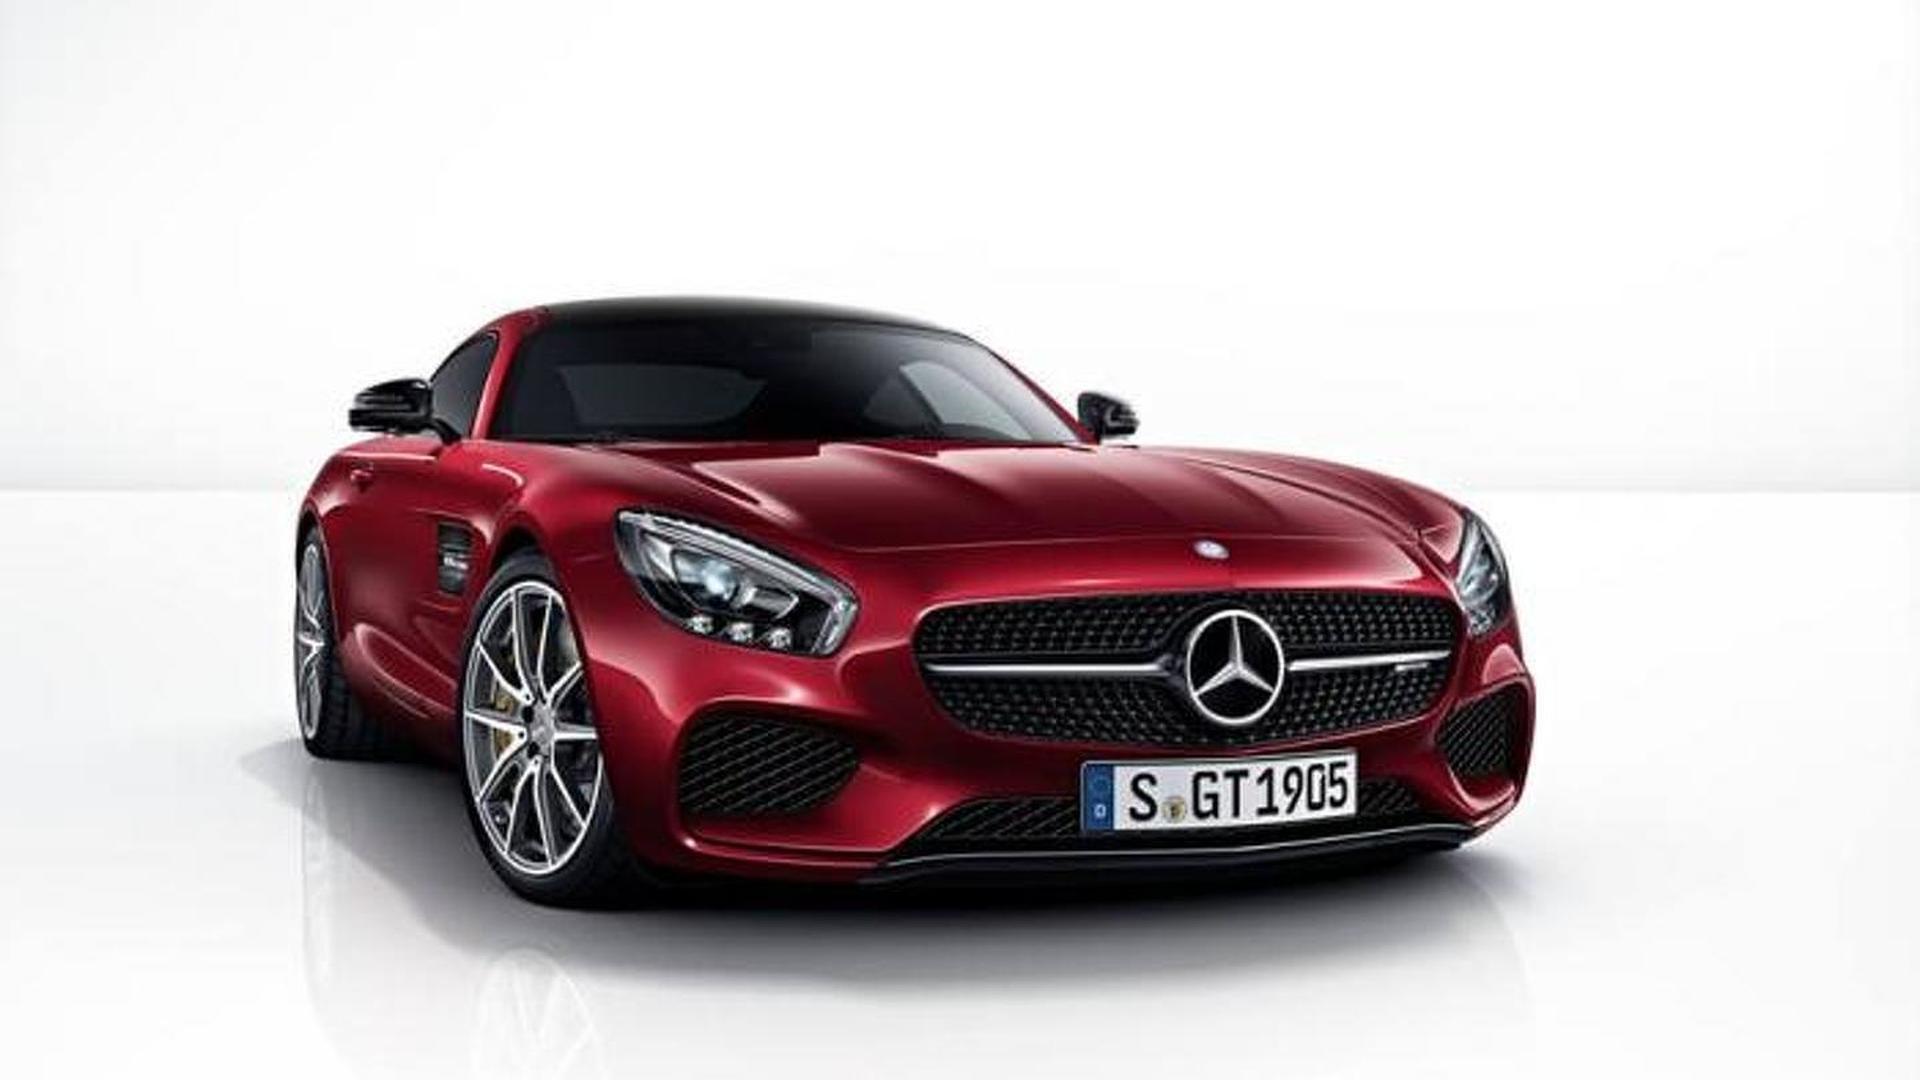 Mercedes shows off the AMG GT color palette